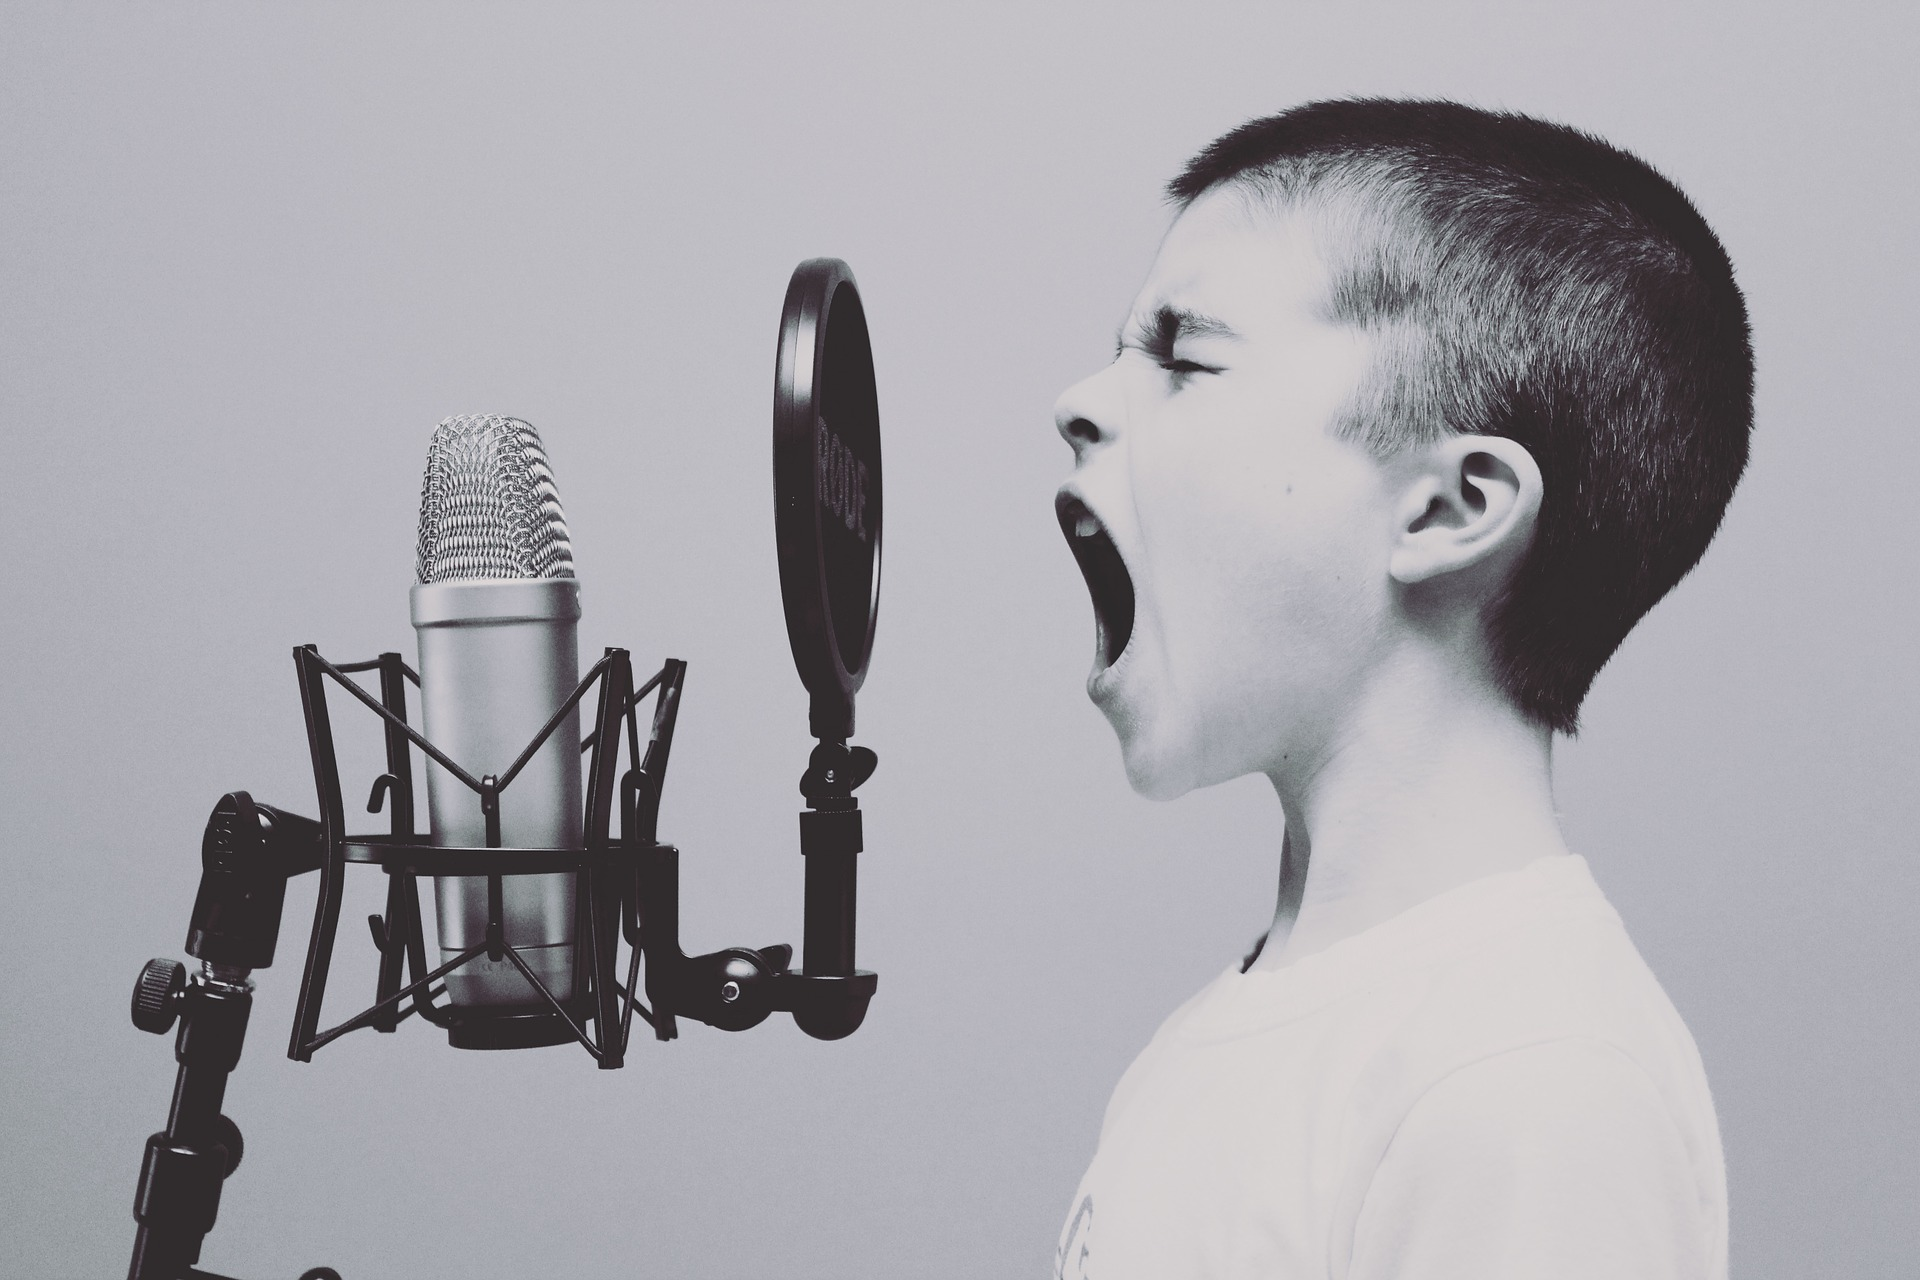 Musicoterapia - psicología infantil